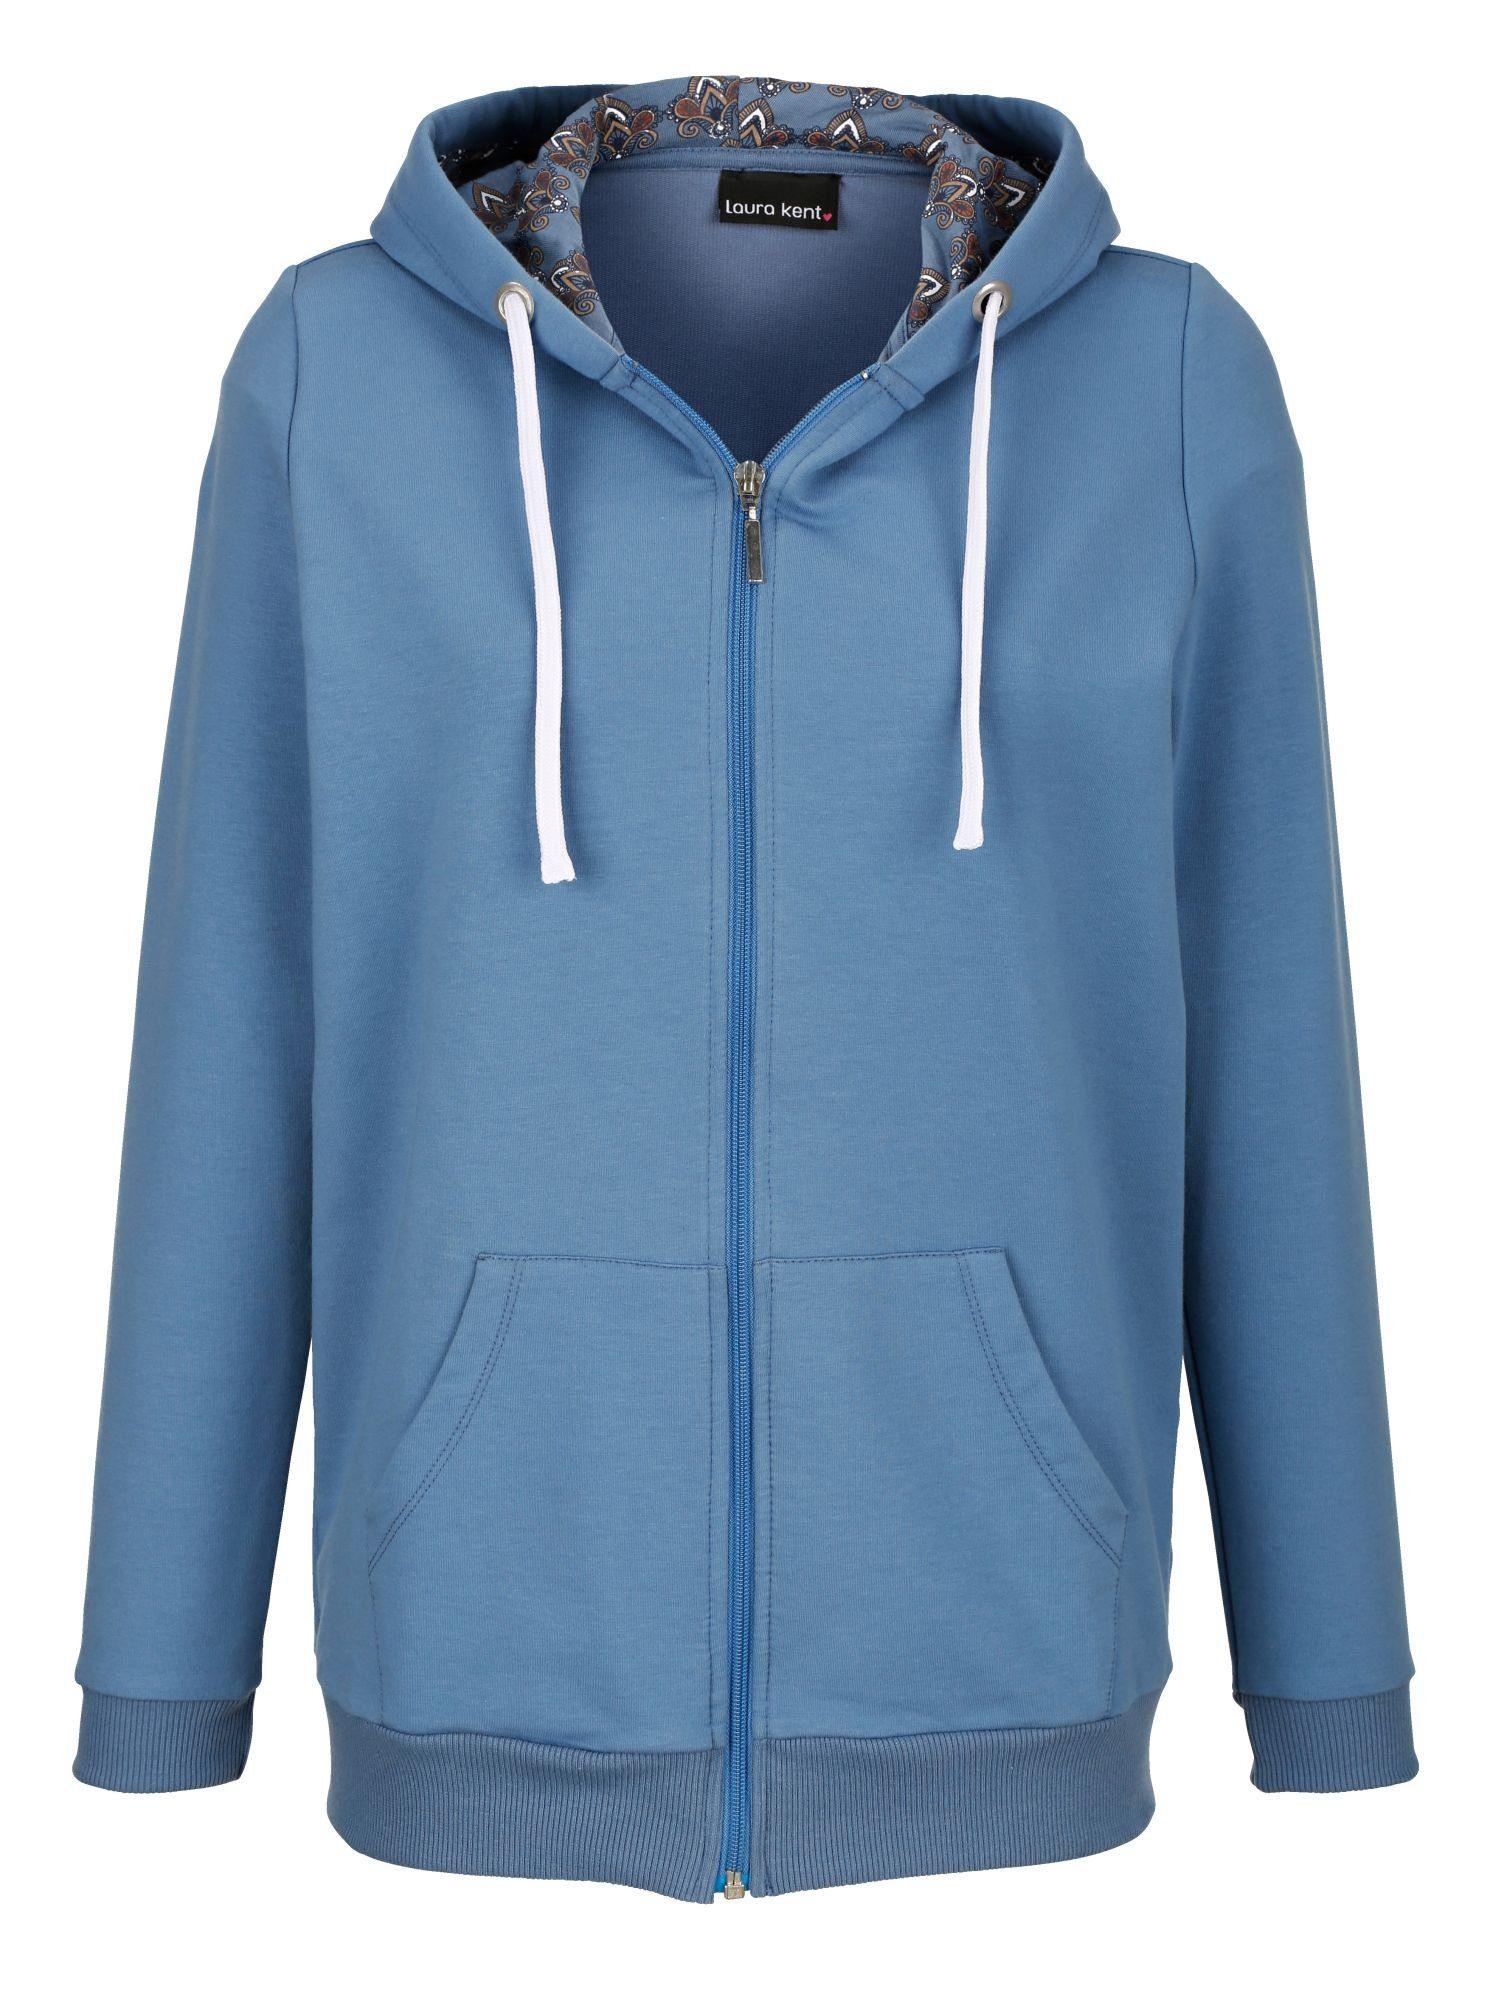 Laura Kent Sweatjacke mit Kängurutasche | Bekleidung > Sweatshirts & -jacken > Sweatjacken | Blau | laura kent